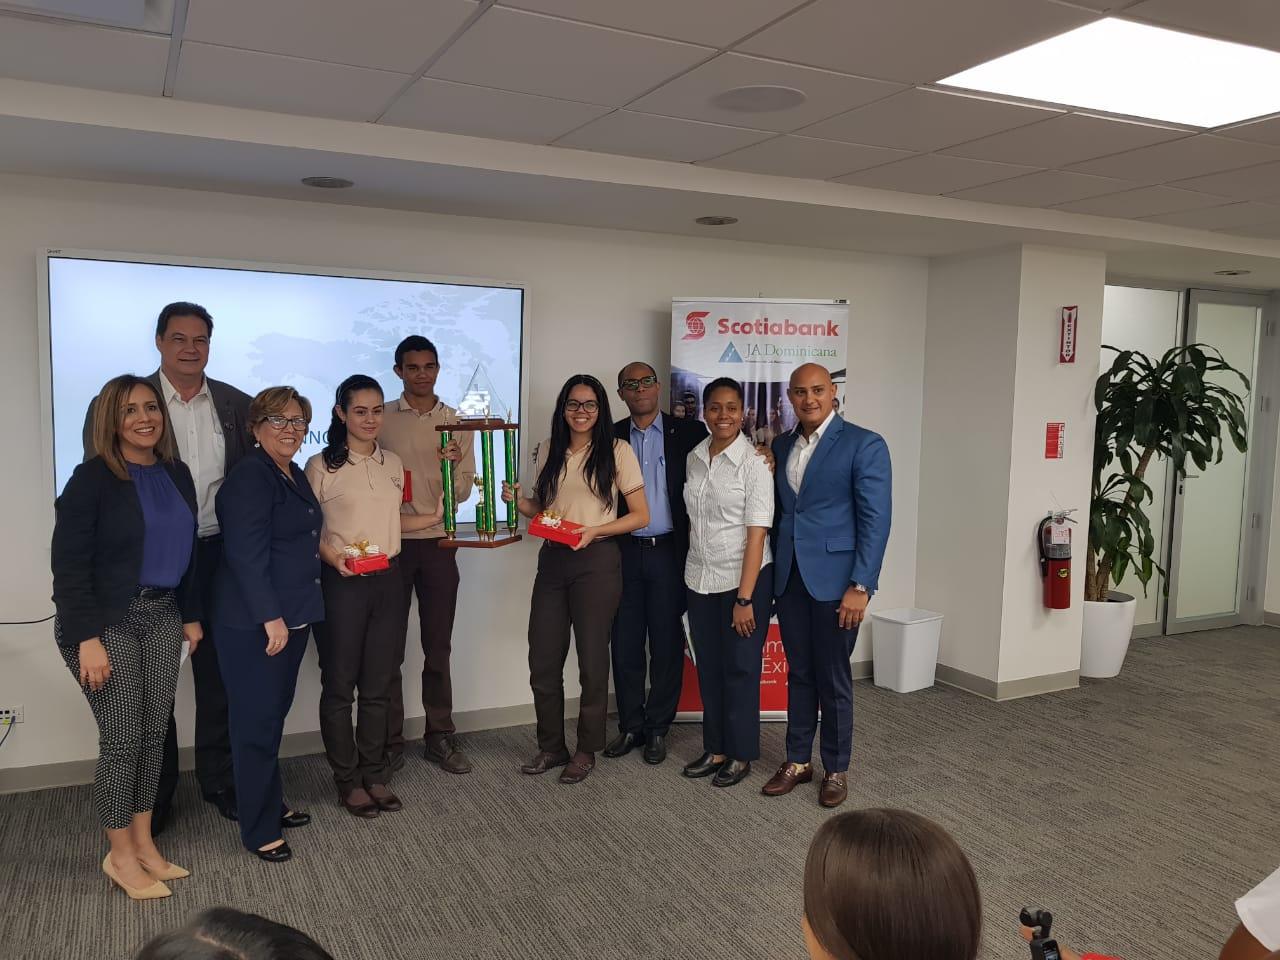 scotiabank equipo ganador campamento de innovación